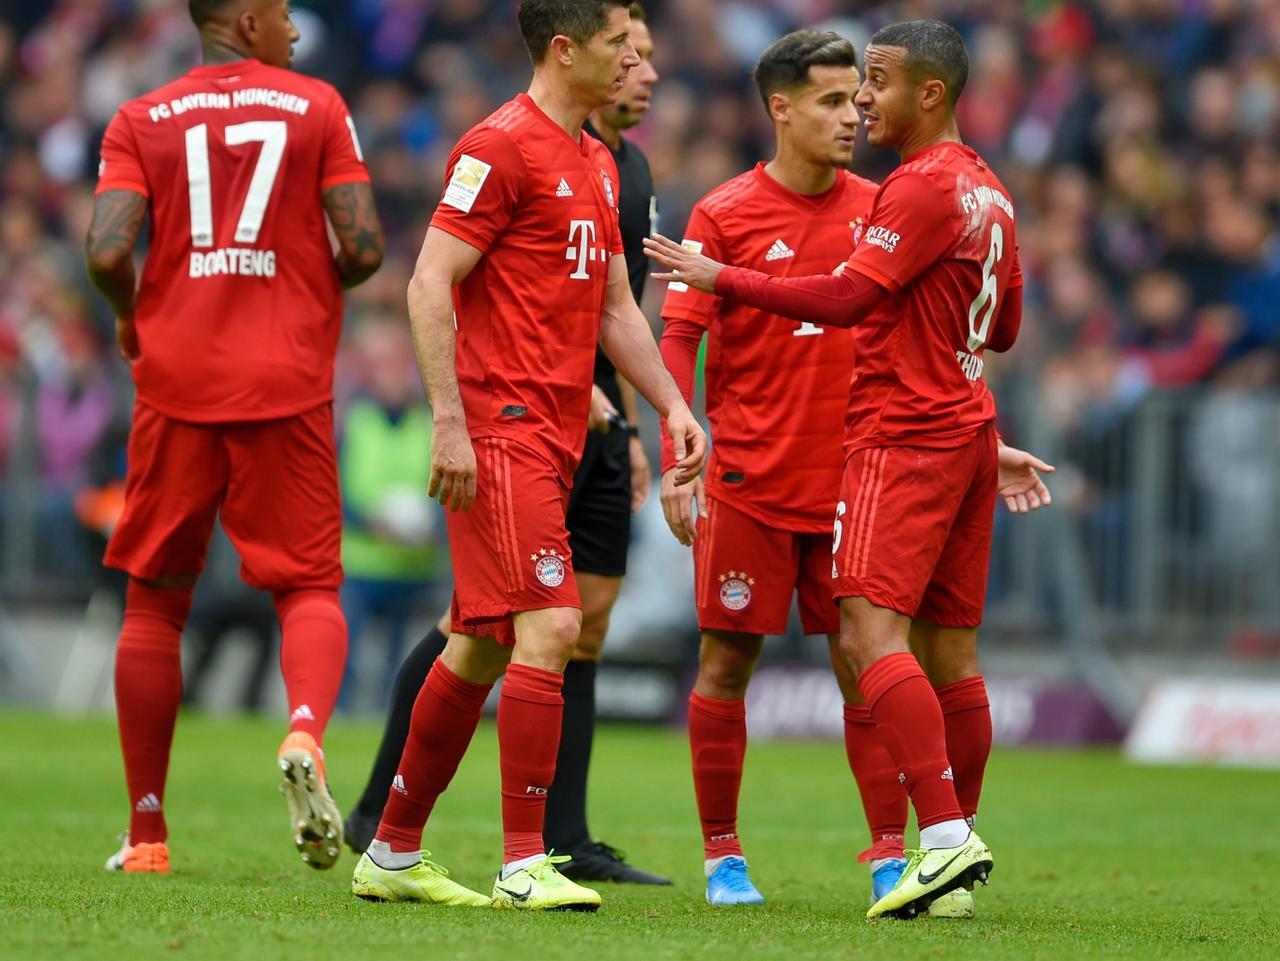 Bayern Olympiakos Live